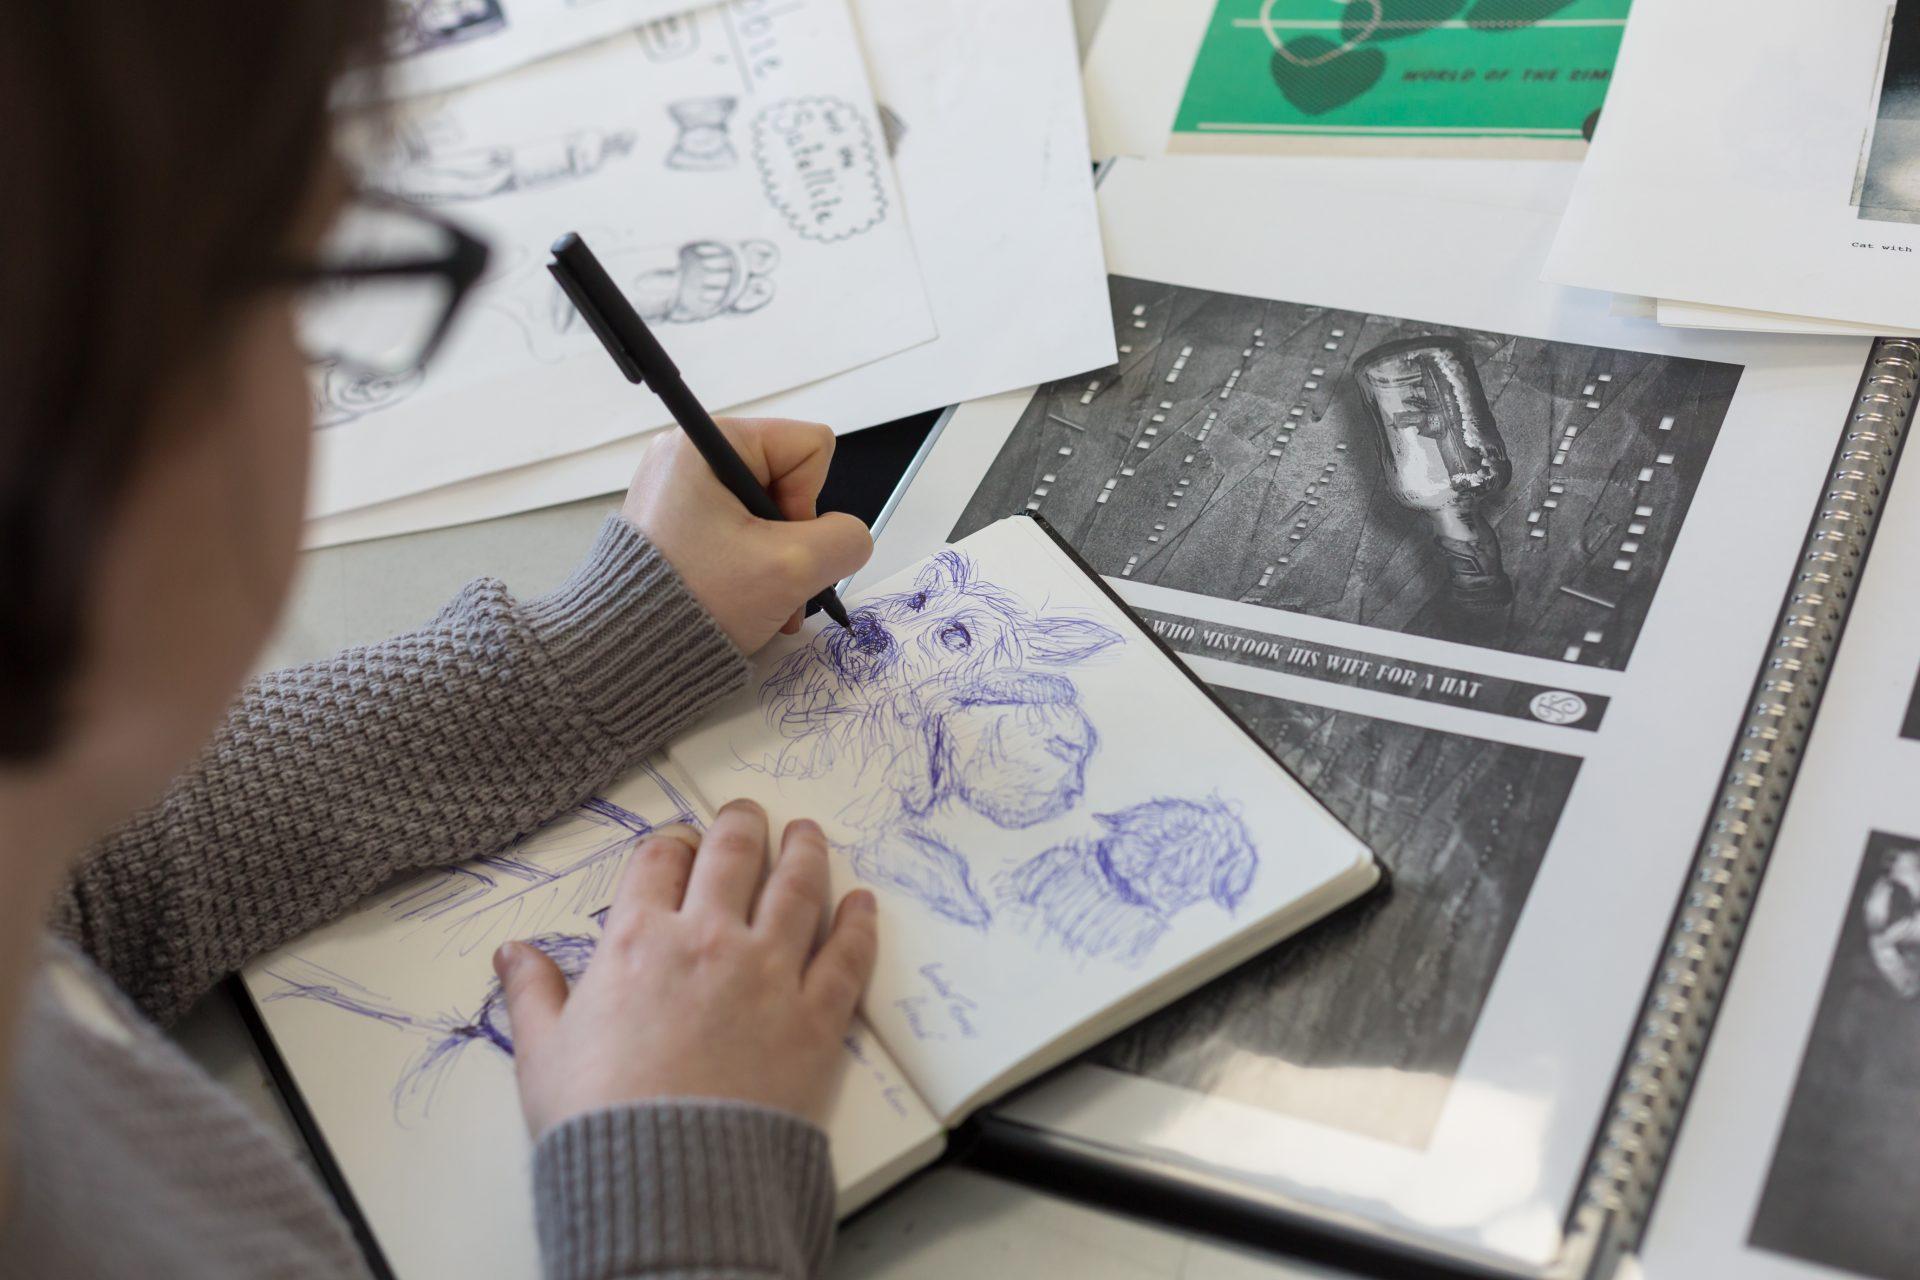 Student drawing in sketchbook.